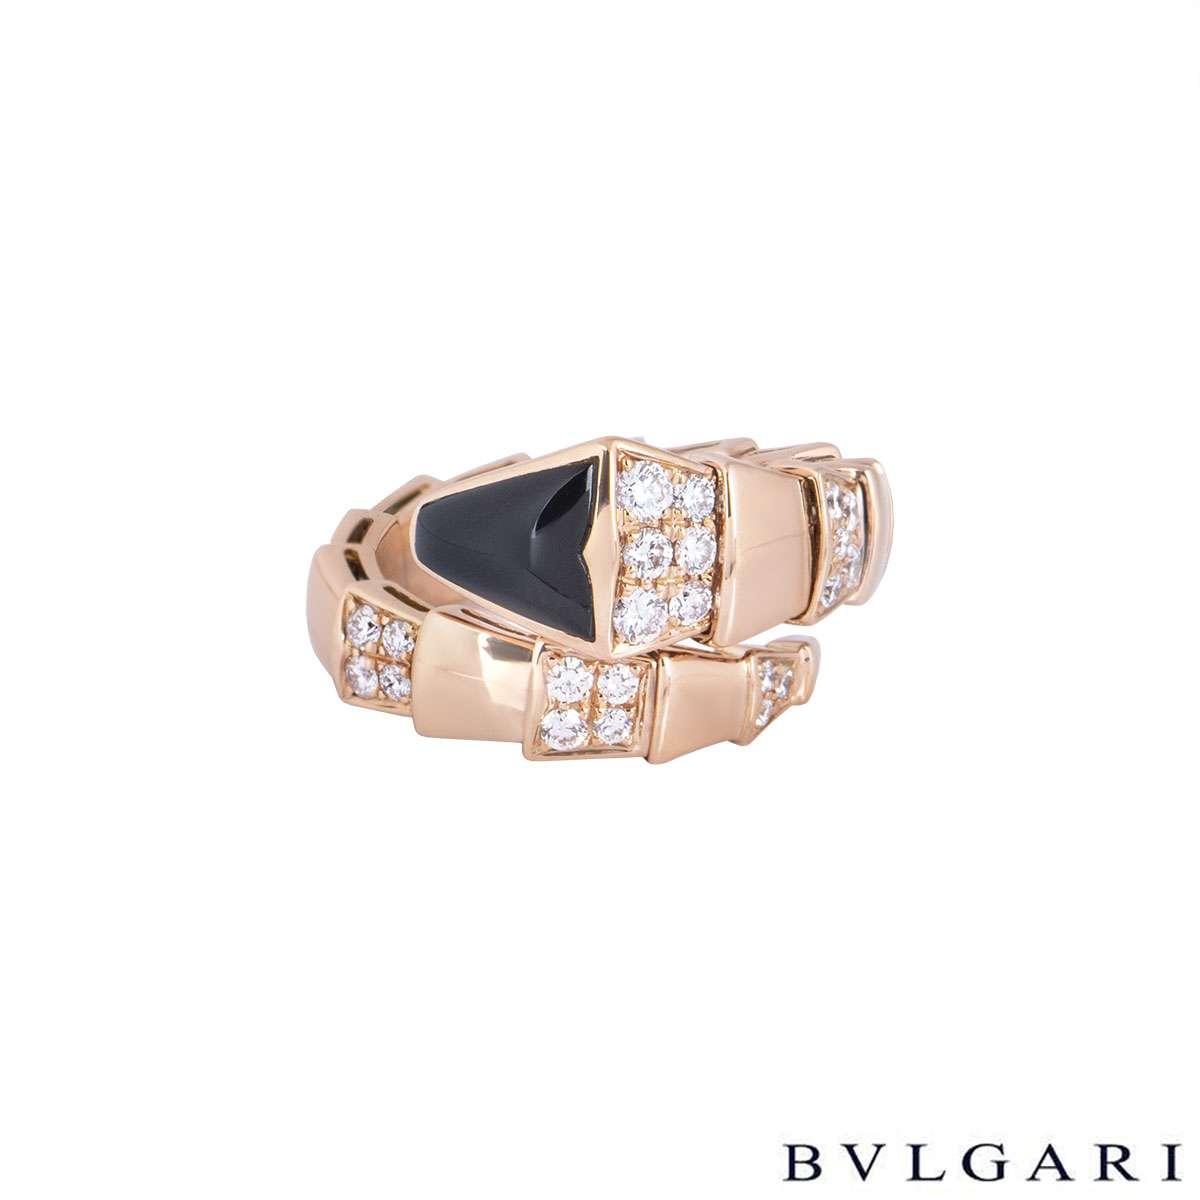 Bvlgari Rose Gold Diamond and Onyx Serpenti Ring